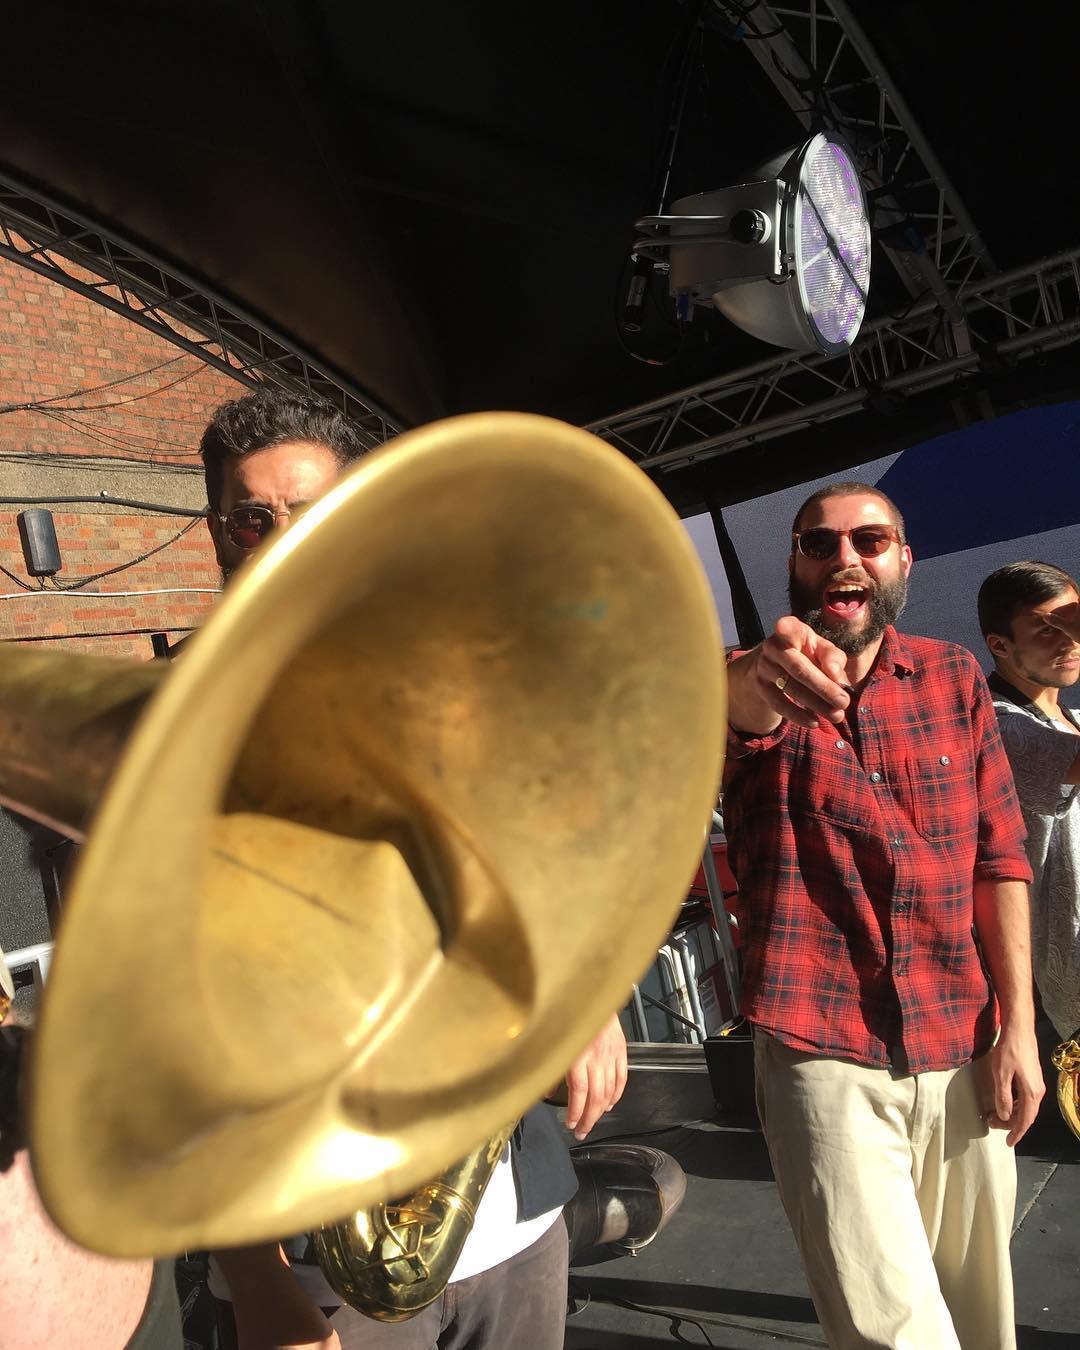 @jakefacenoise custom trumpets. Contact us on here for enquiries  #Trumpet #trumpetindonesia #trumpettrio #trumpetsleeve #trumpetevents #trumpetlessons #trumpetplayers #trumpeteer #TrumpetVideo #trumpetvinecatering #trumpetteacher #trumpetsfordays #trumpetflower #trumpetmaker #trumpetswan #trumpetlife #TrumpetTrumpetSynthesizer #trumpetshaped #TrumpetX #trumpetsolo #TrumpetGown #TrumpetRecital #trumpetmbbpkt #trumpetporn #trumpet #trumpette #trumpetfish #trumpettree #trumpetego #trumpetjazz